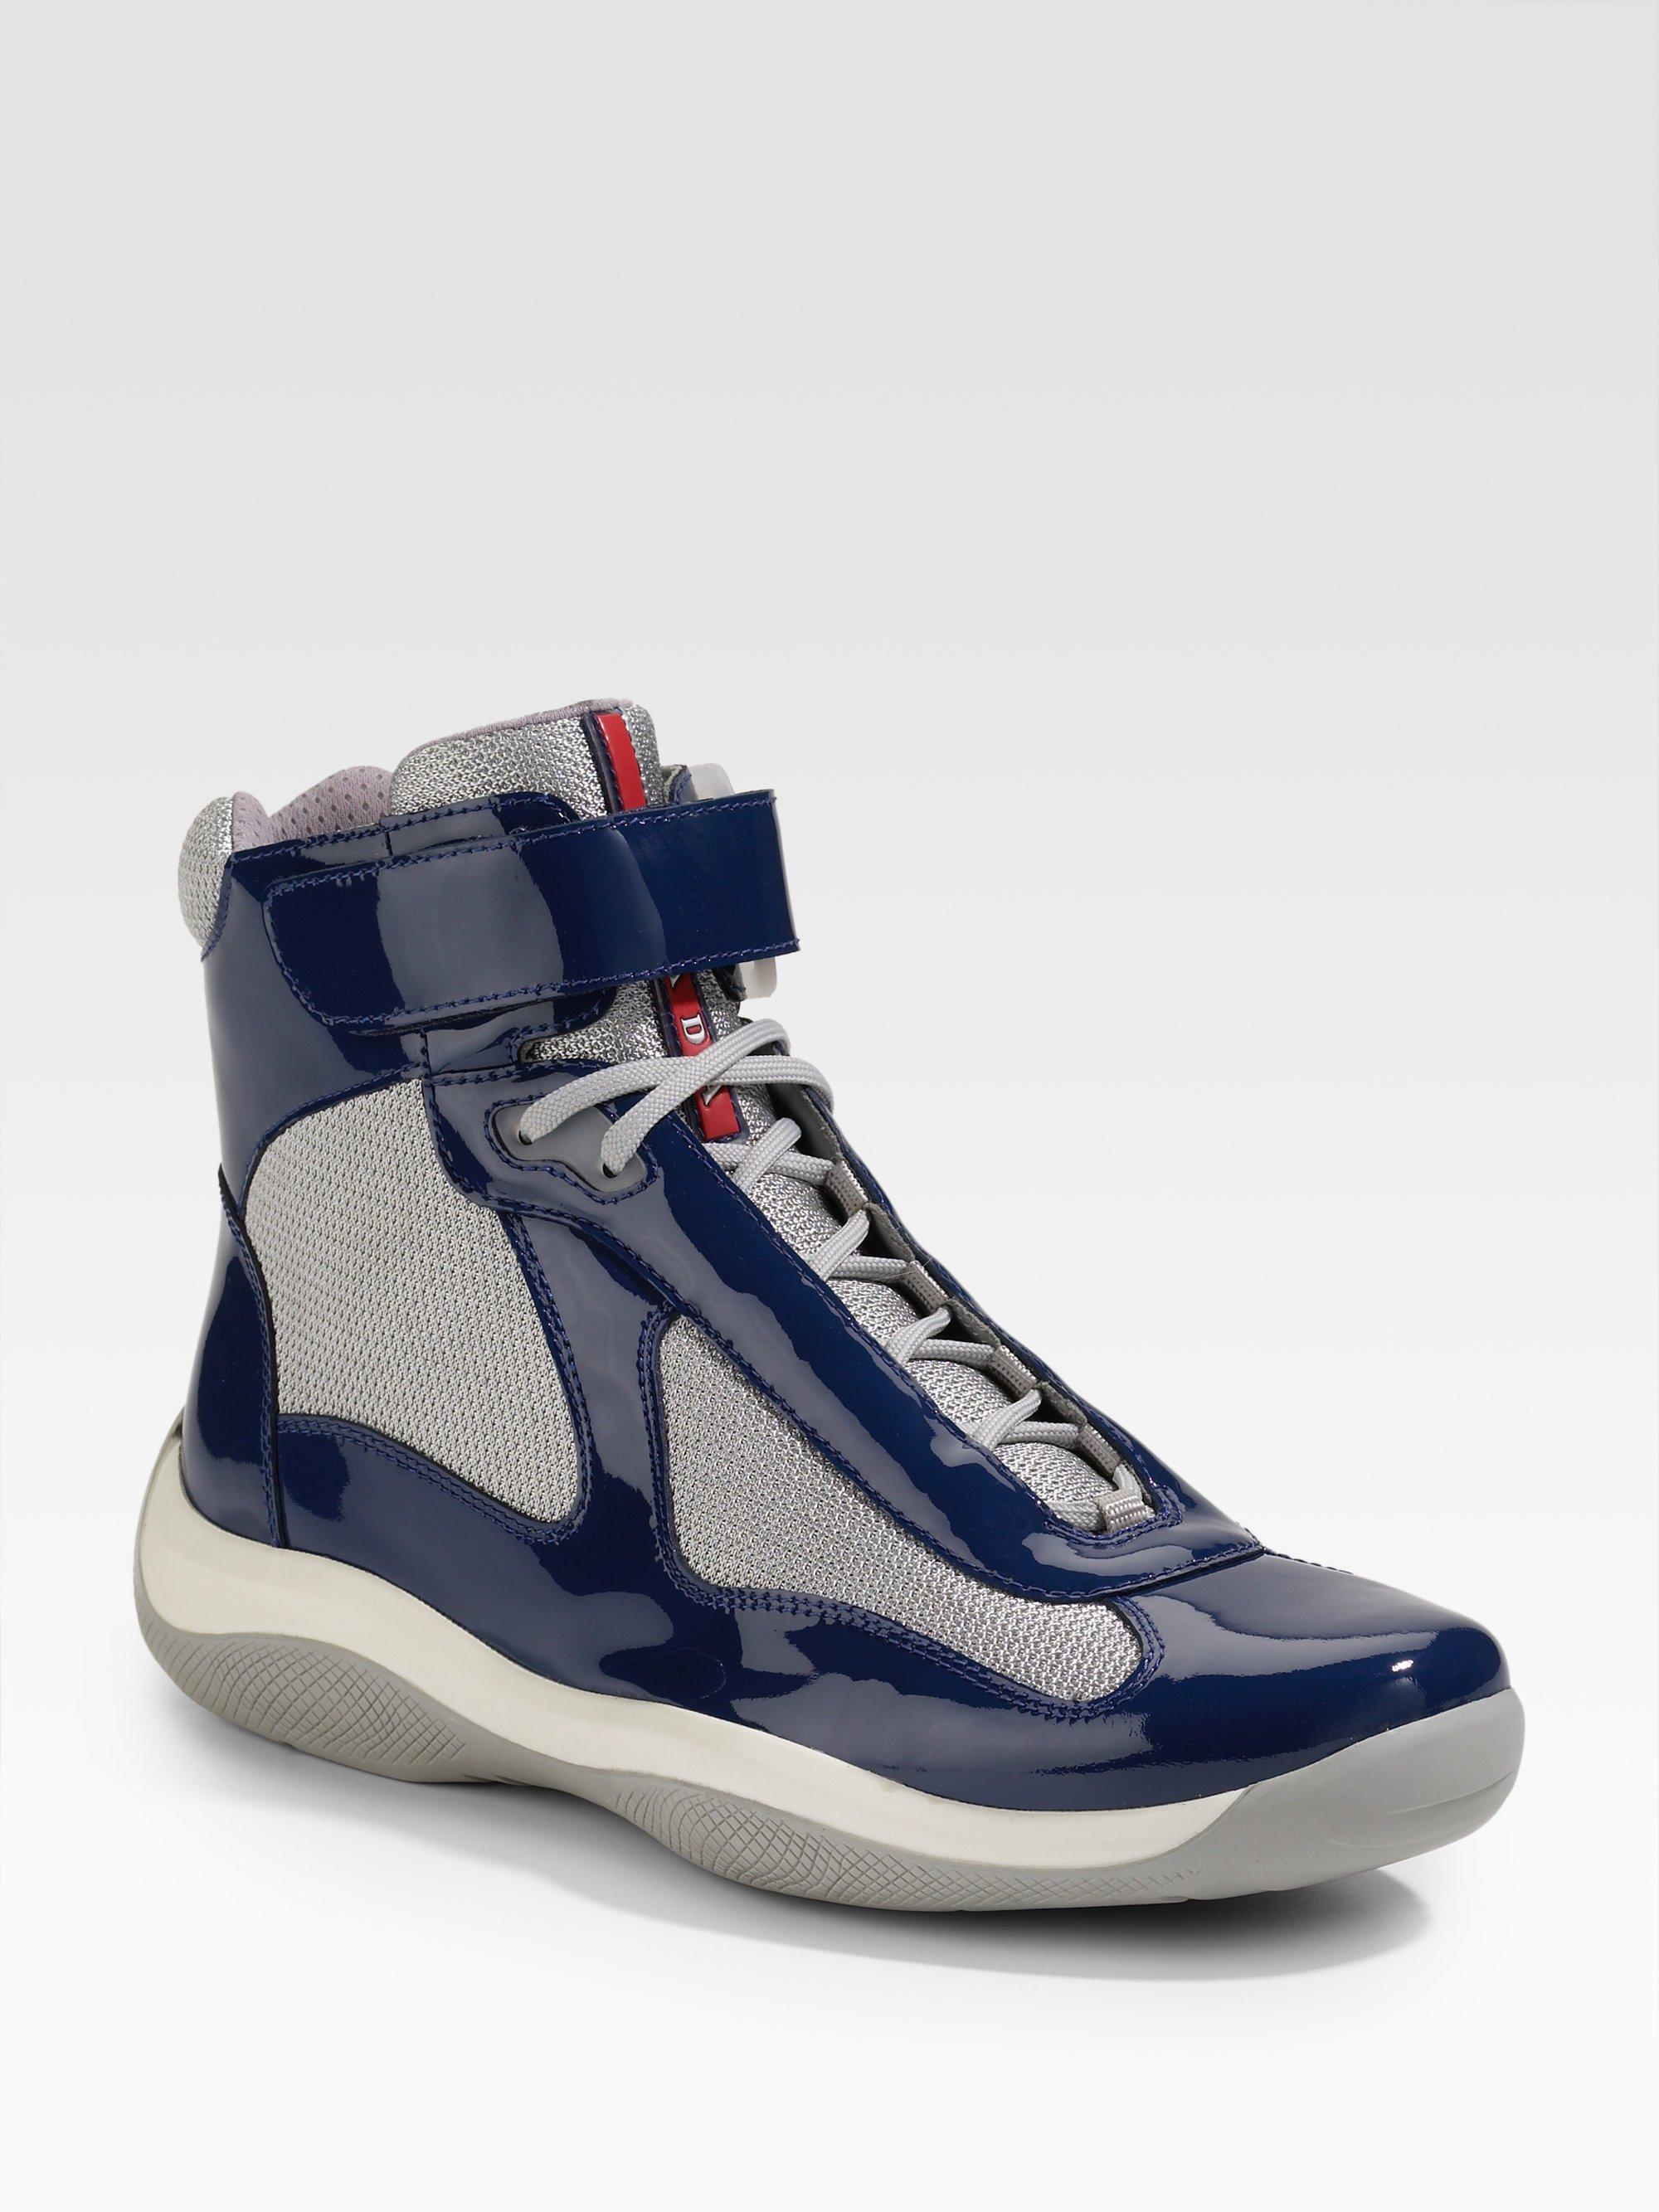 Prada Hightop Patent Sneakers in Dark Red Red Lyst